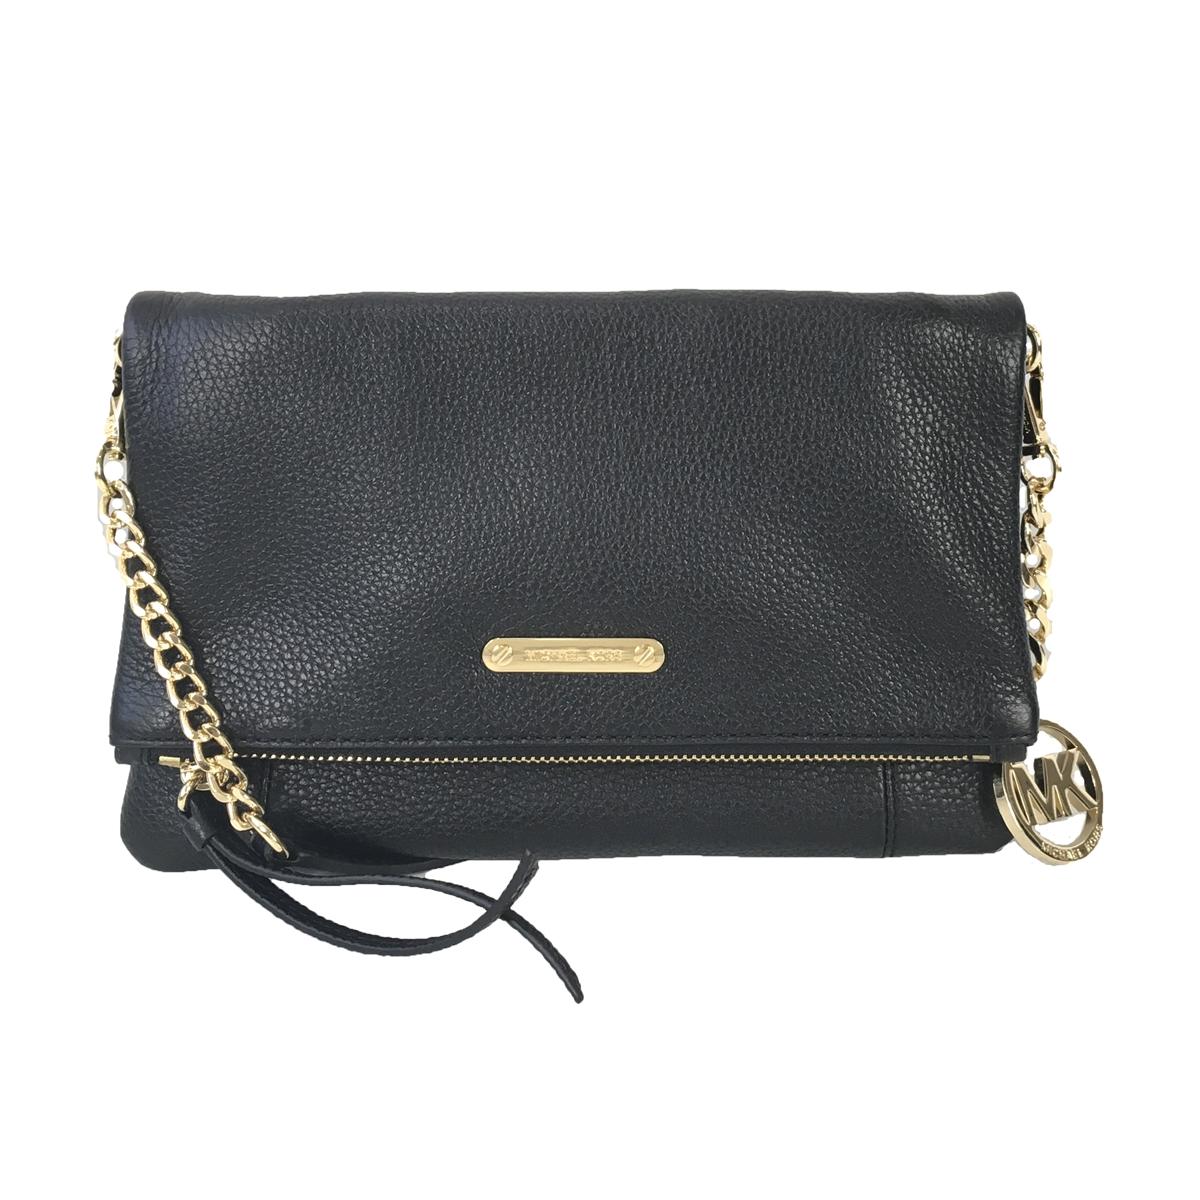 20c98c85752d Michael Kors Corinne Leather MD Messenger Crossbody Bag